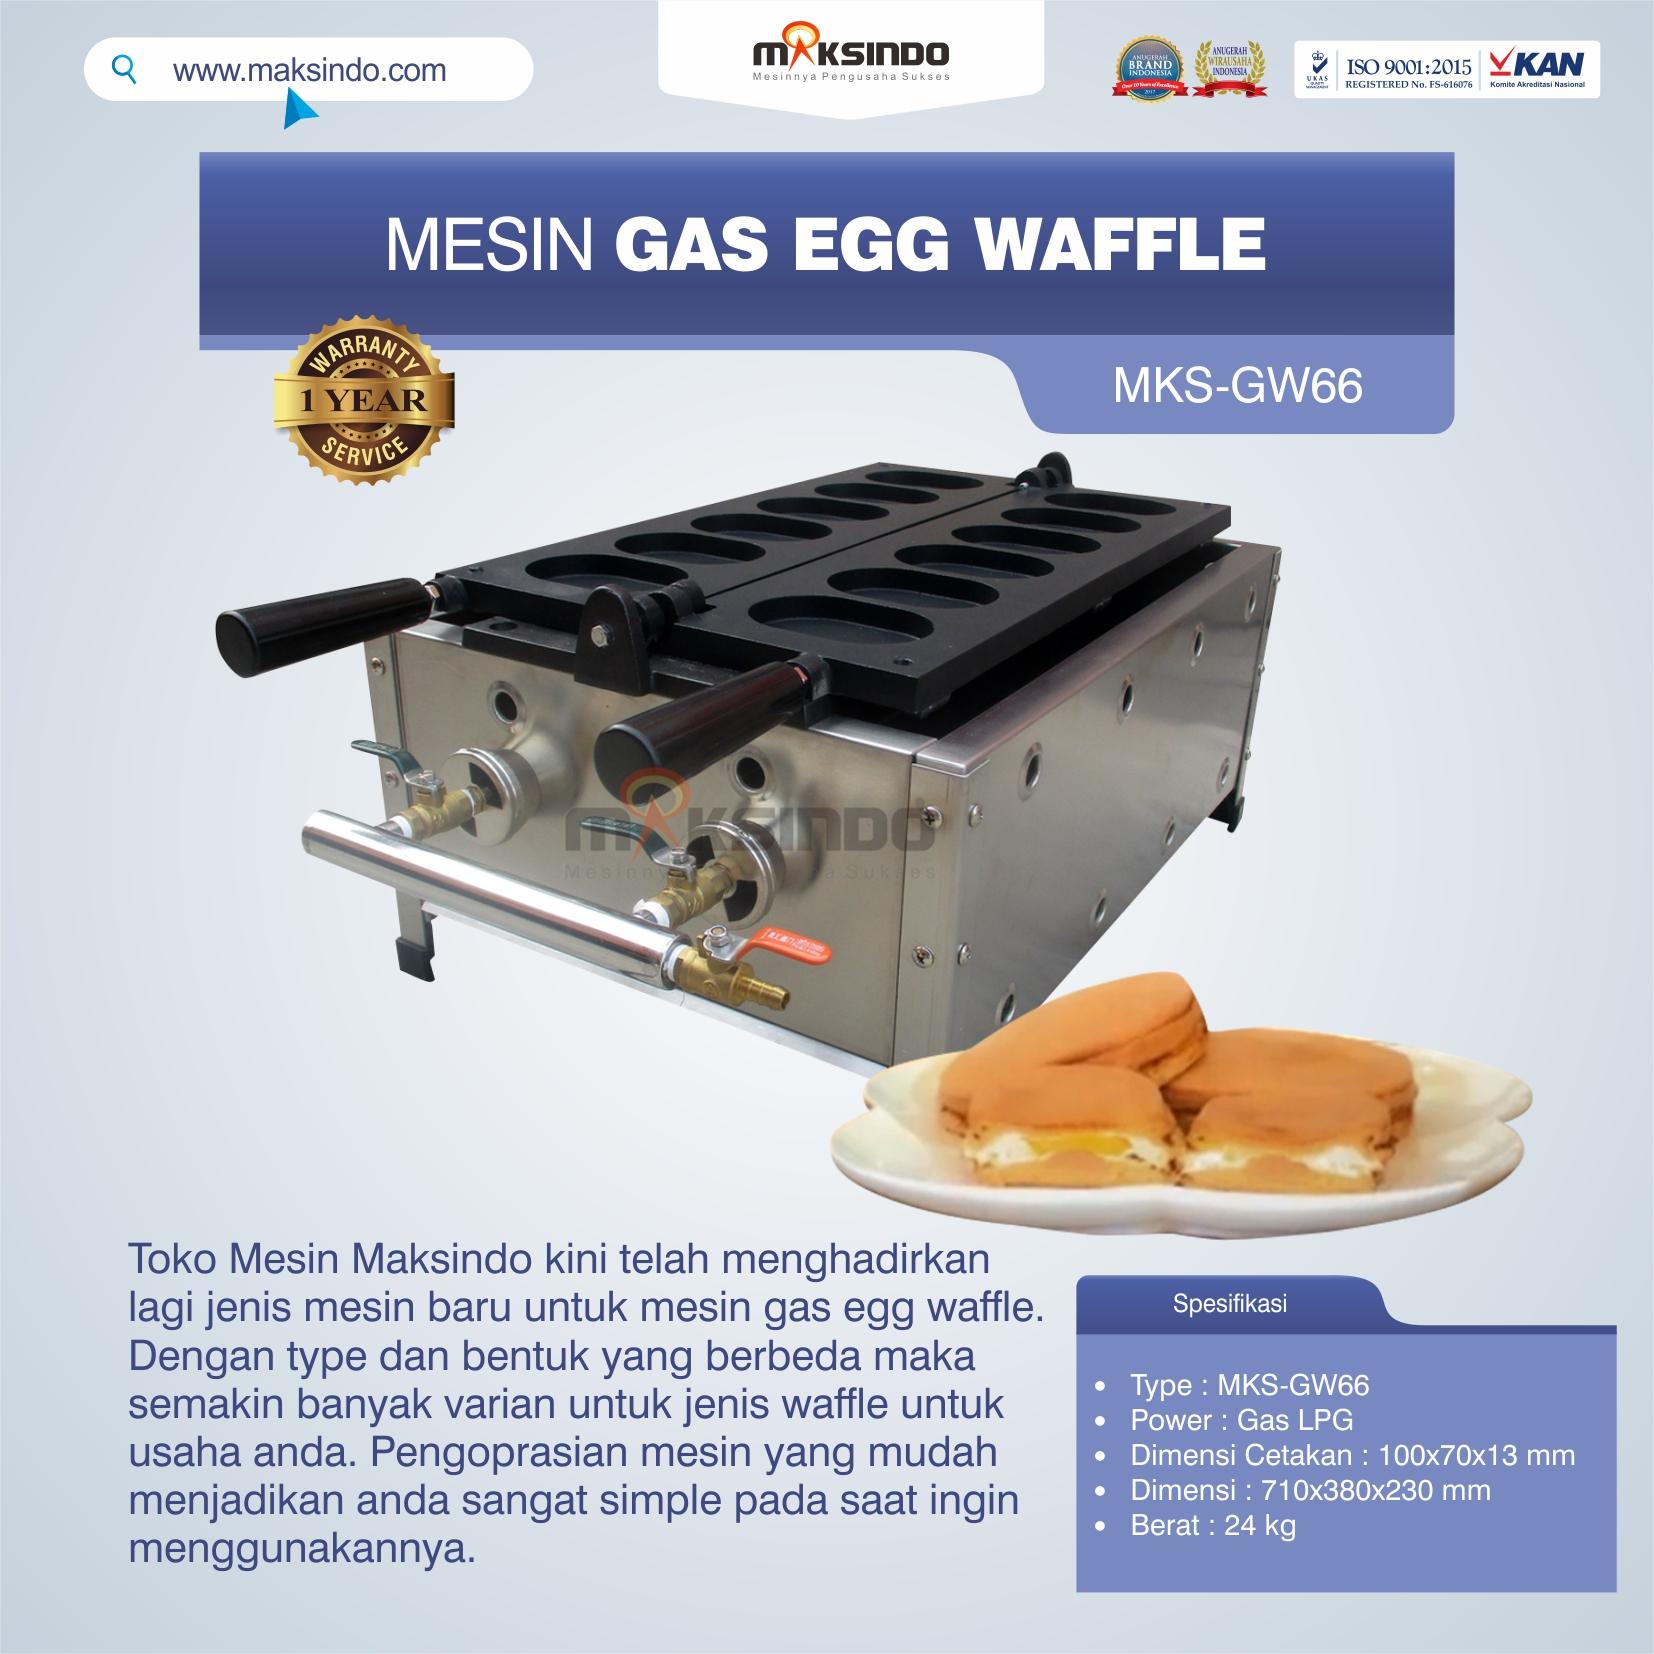 Jual Mesin Gas Egg Waffle MKS-GW66 Di Solo